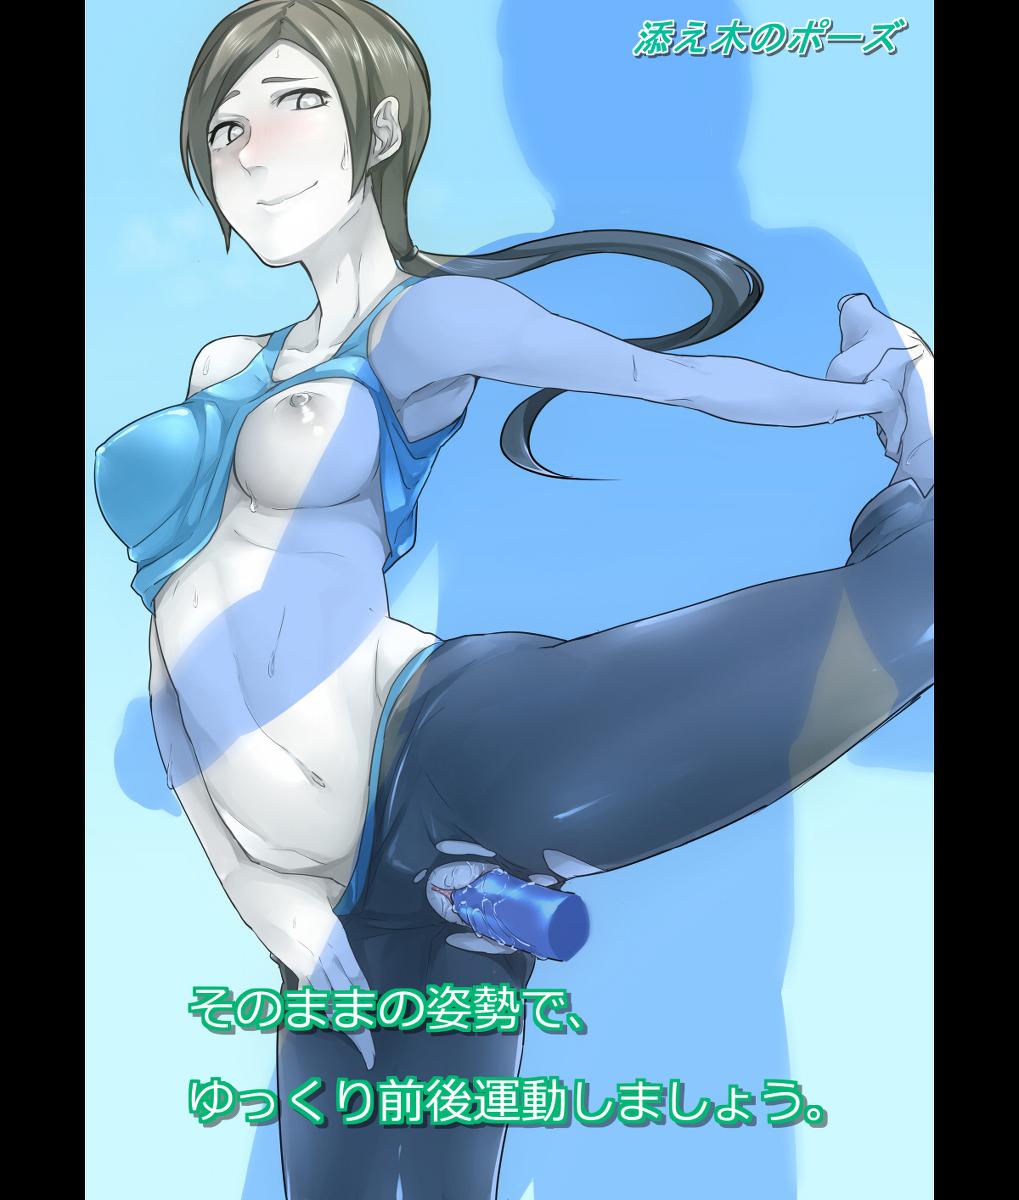 Wii hentai nude galleries